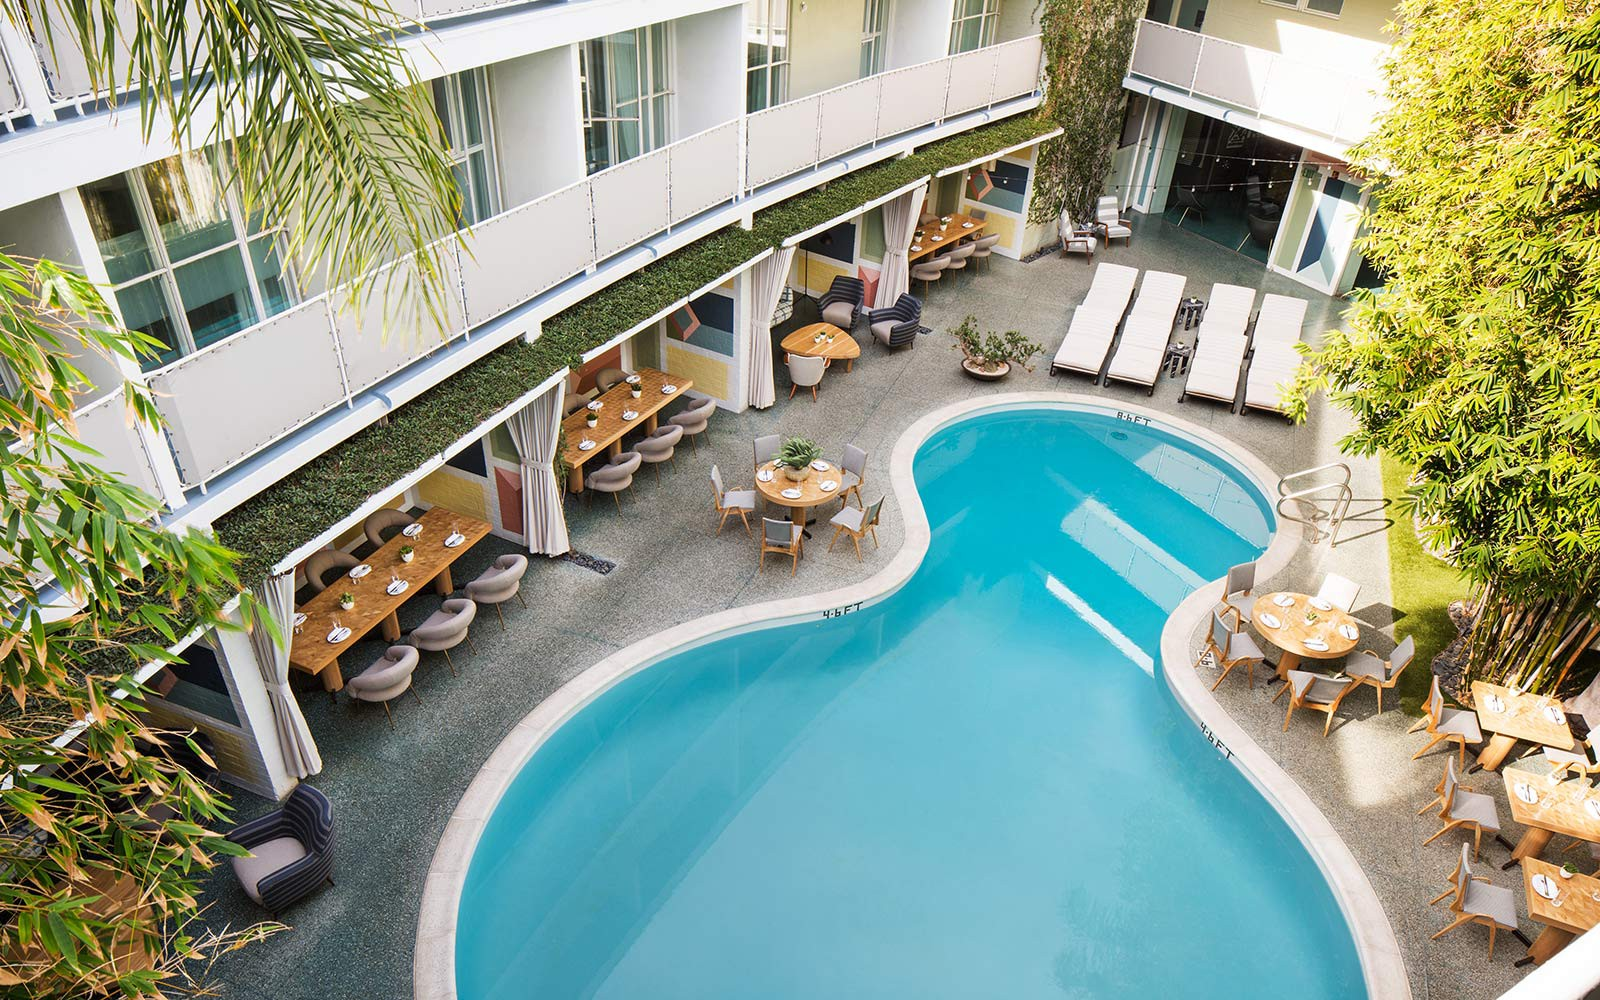 Courtesy of Avalon Hotel Beverly Hills / Expedia